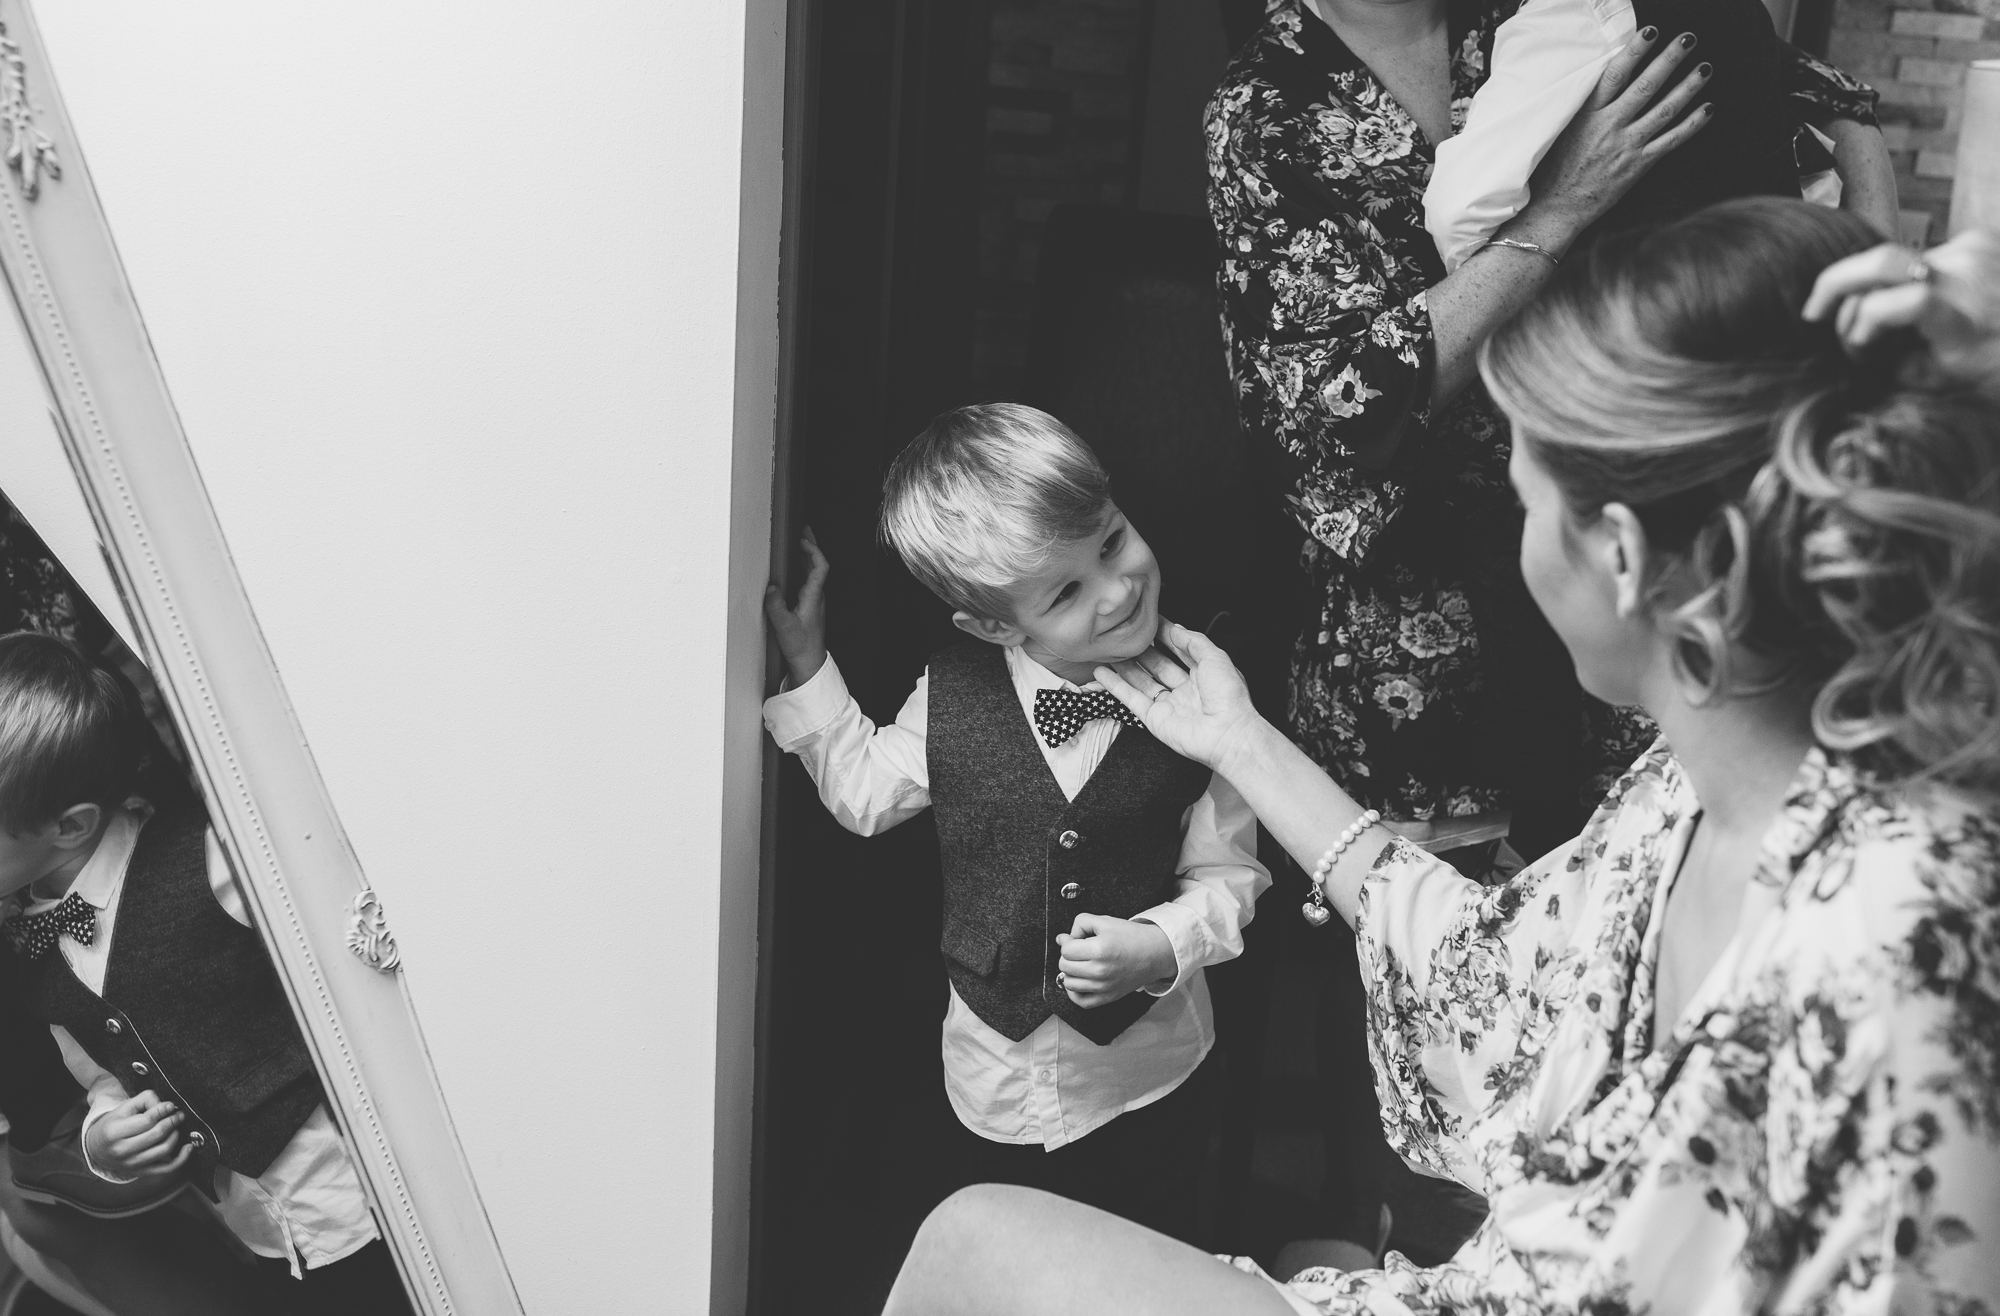 weddingphotographeraberdeen (17 of 9).jpg